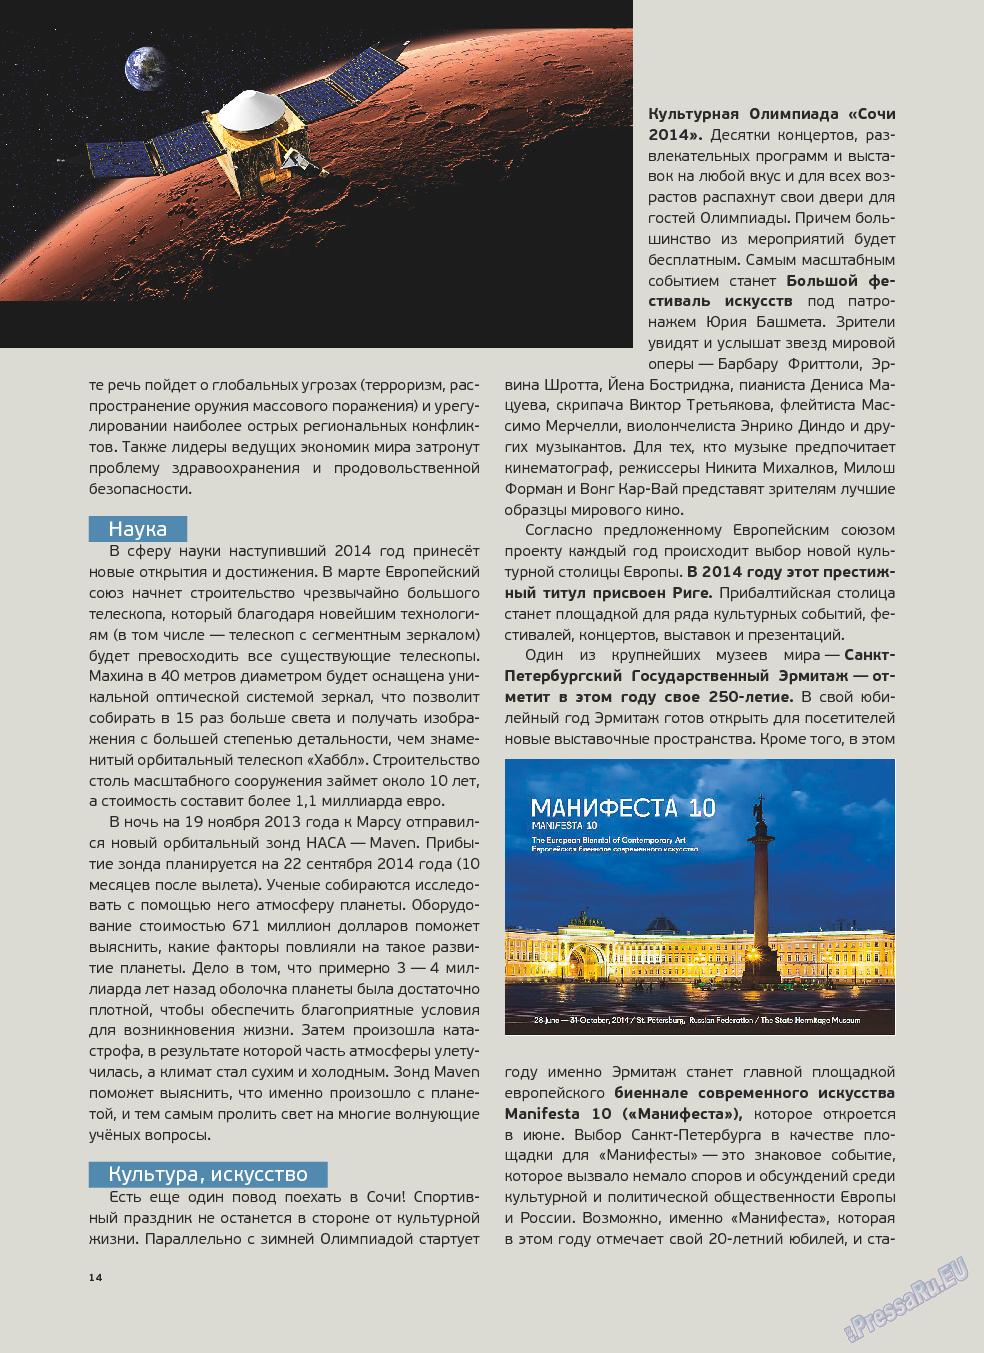 Артек (журнал). 2013 год, номер 6, стр. 16